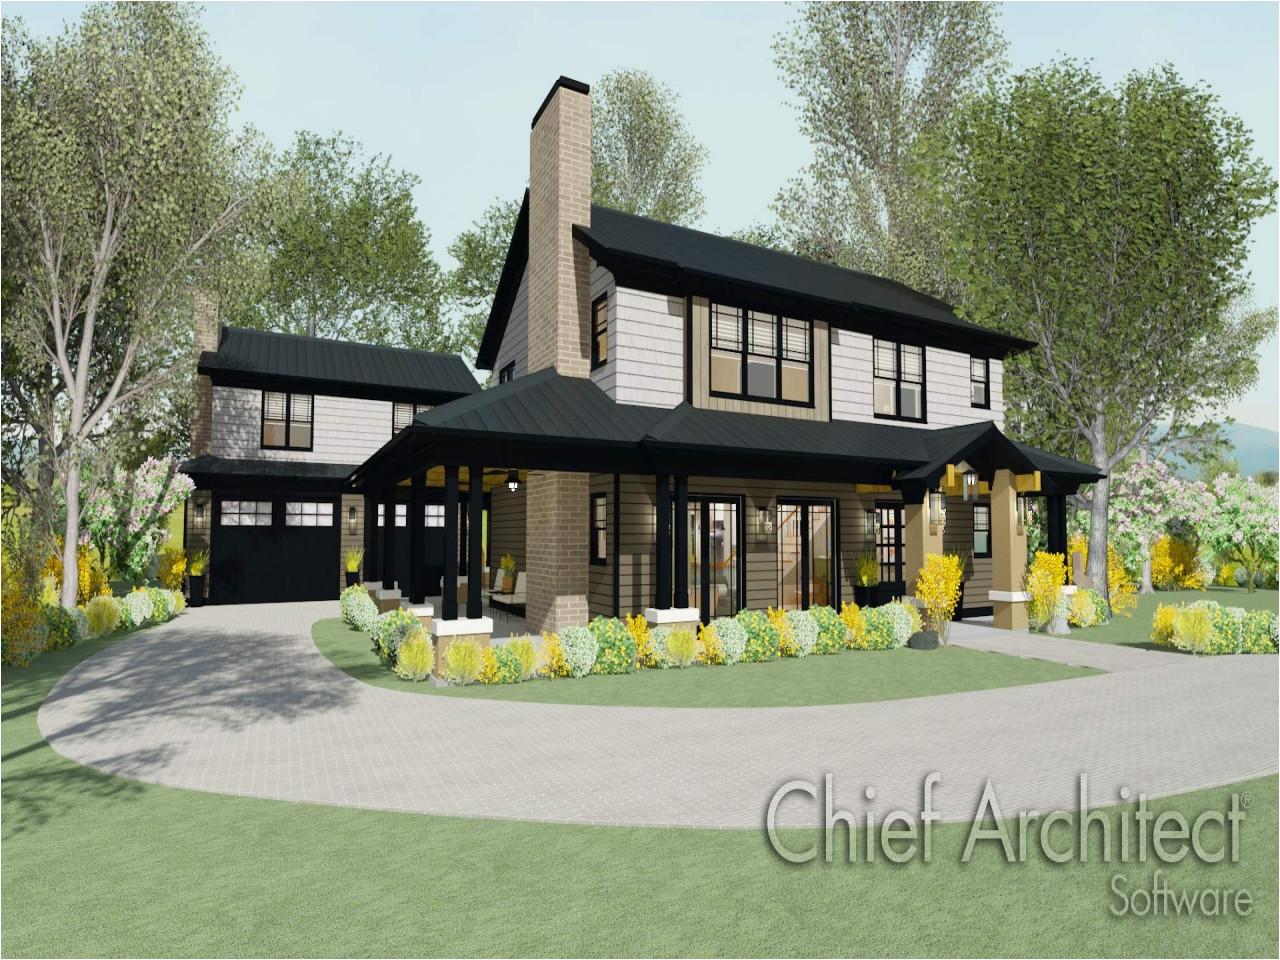 ab9c37b513bd354e chief architect home designs architect 3d design